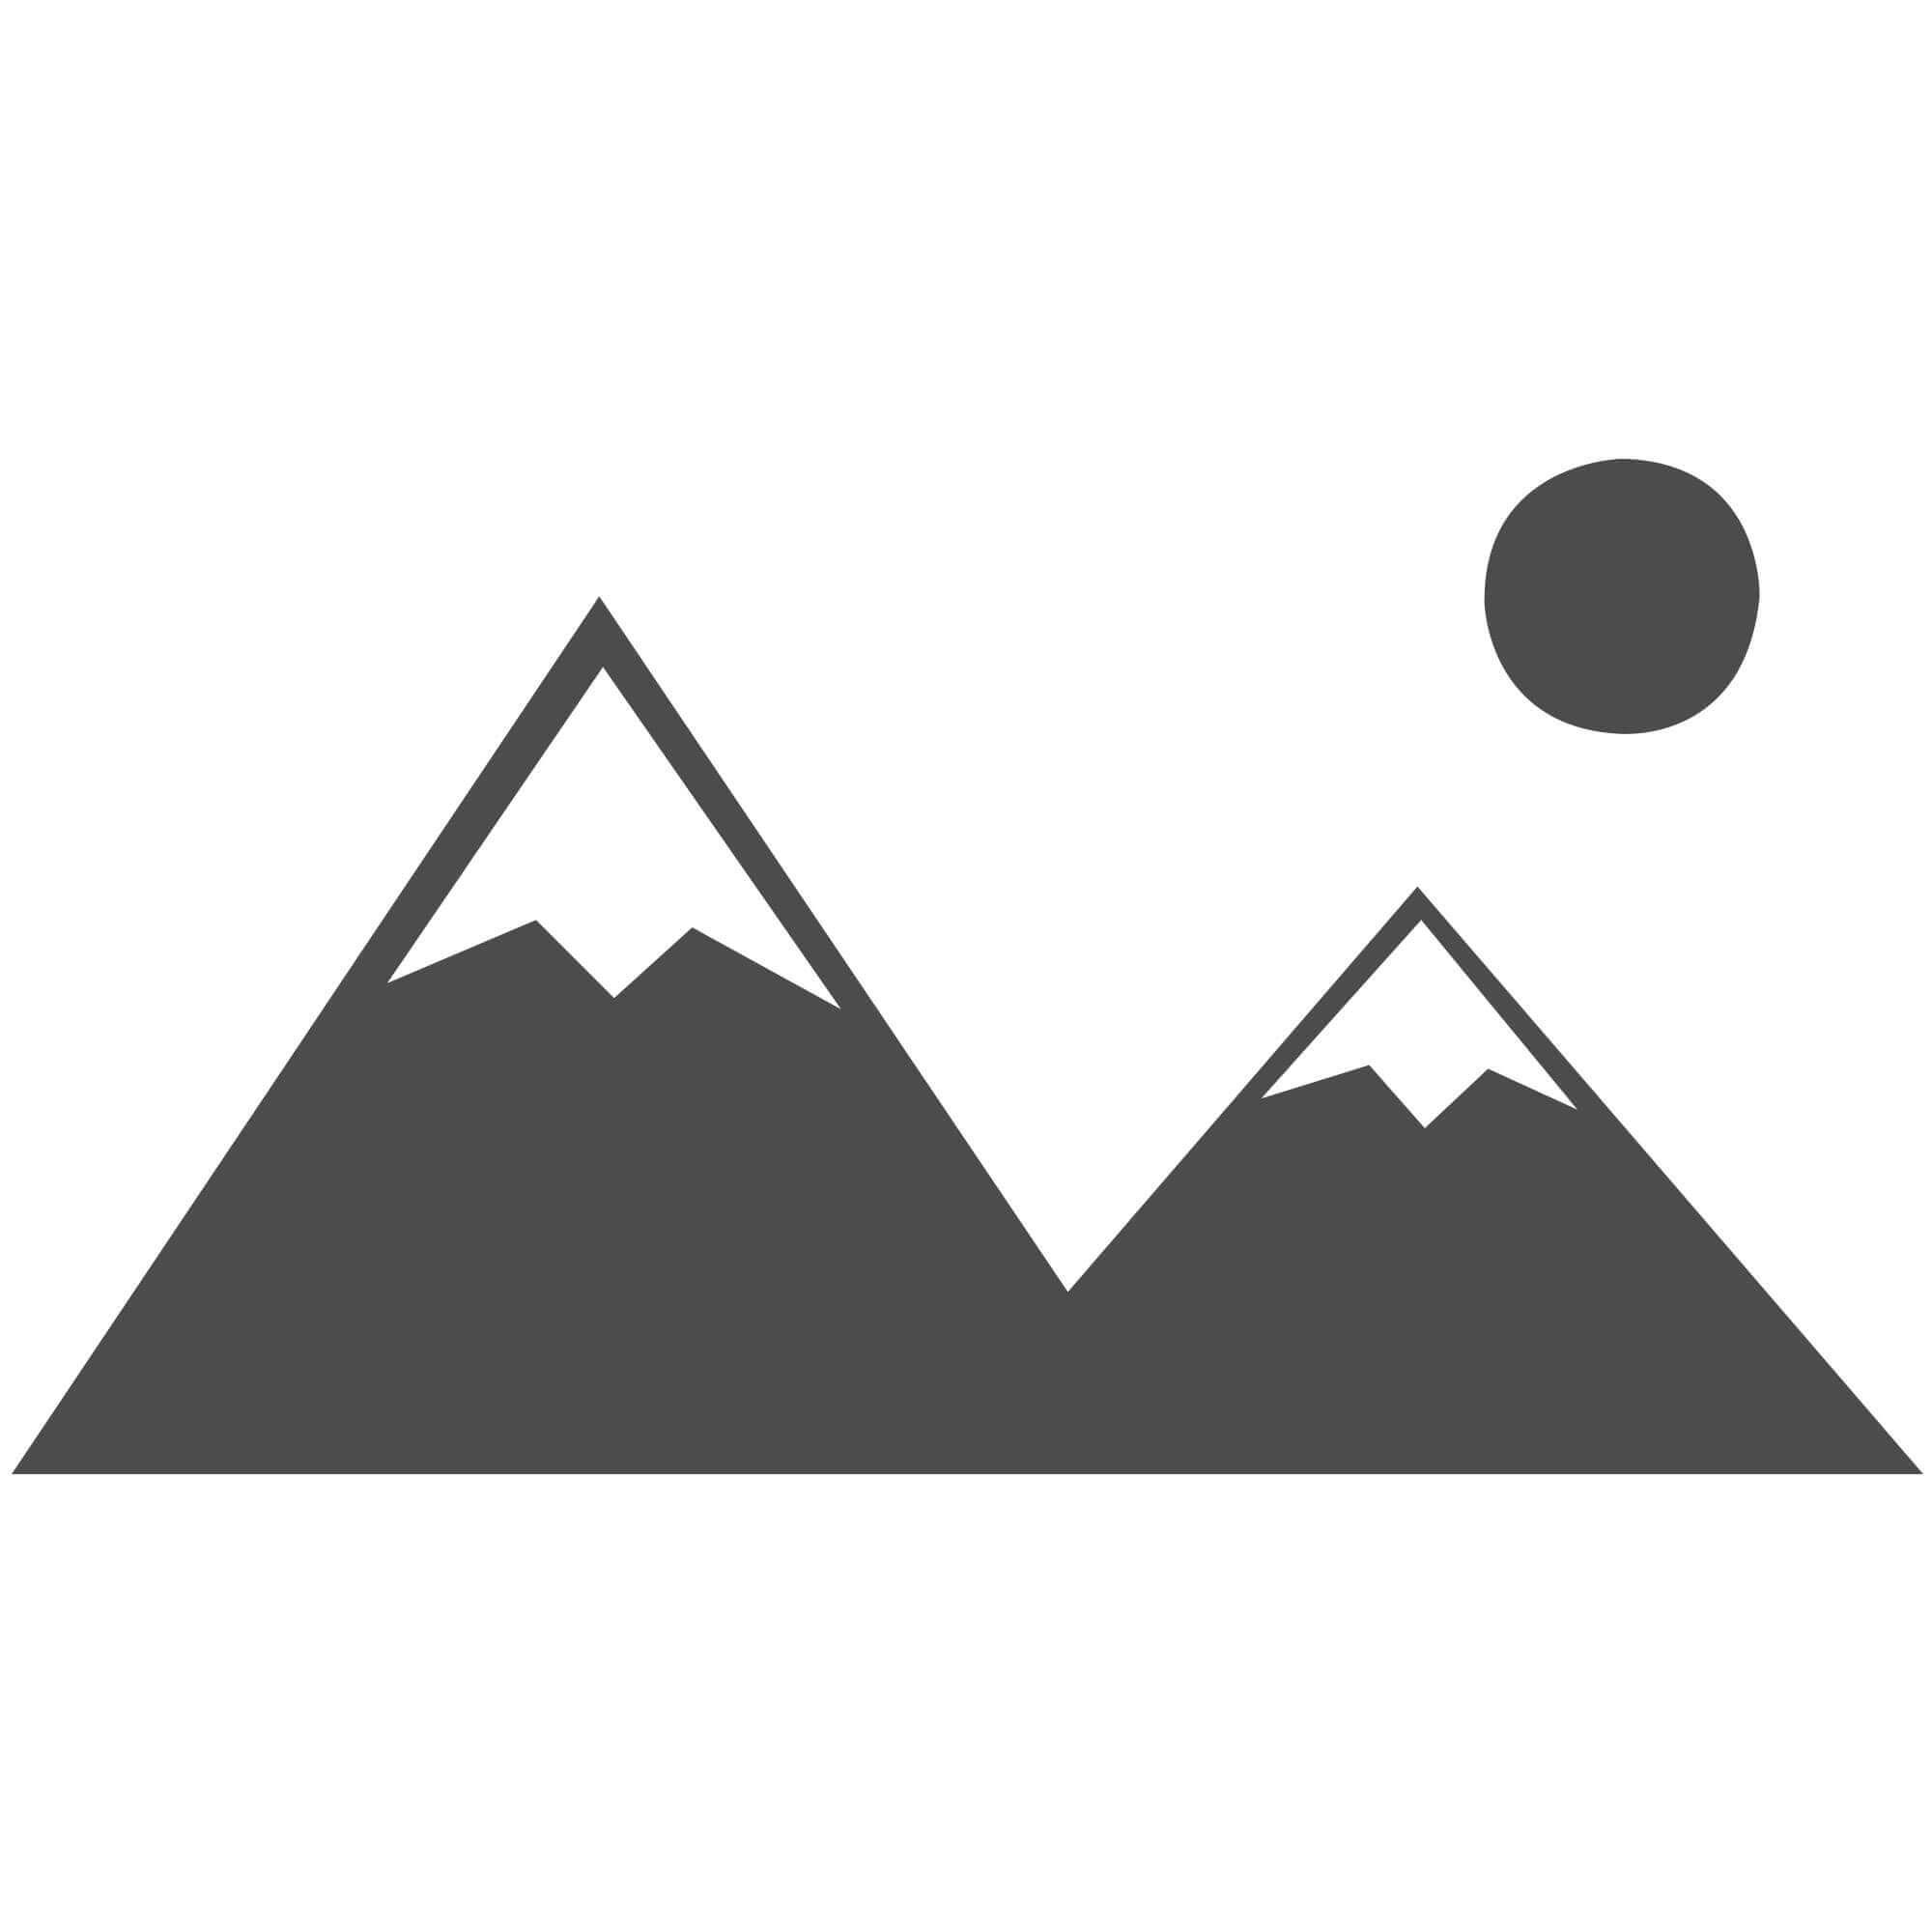 "Velvet Shaggy Rug - Silver - Size 160 x 230 cm (5'3"" x 7'7"")"